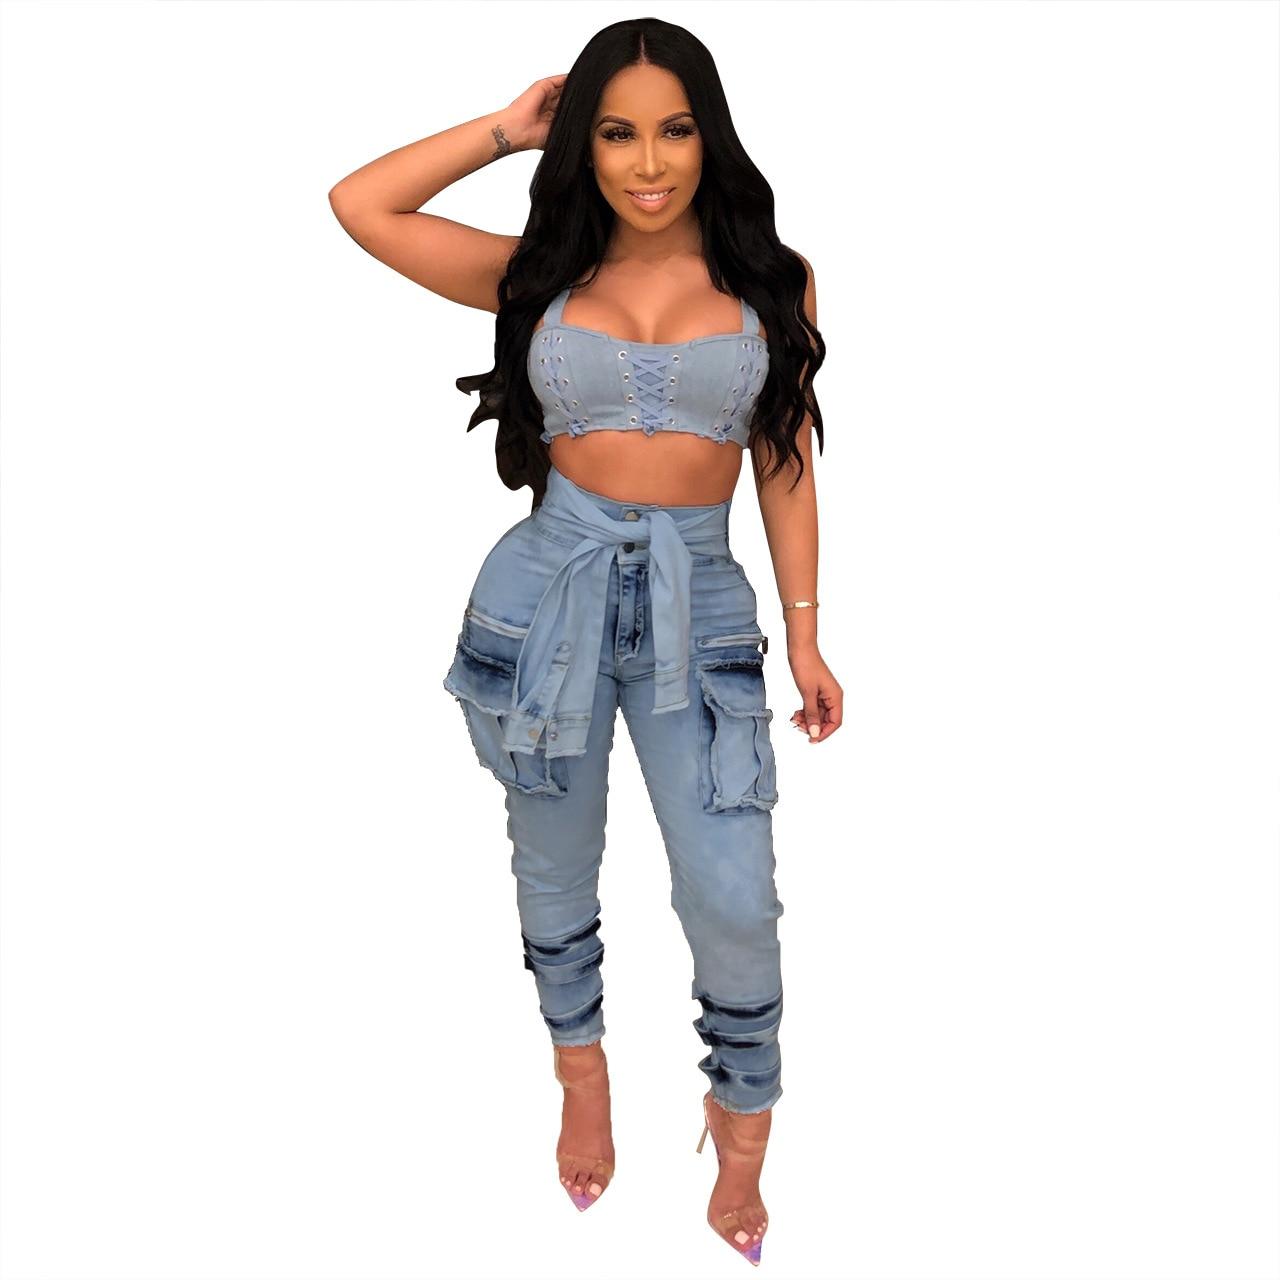 2019 New Summer Women Tie High Waist With Pocket Pencil Long Jeans Vintage Fashion Denim Pants Classic Beach Pants Q255